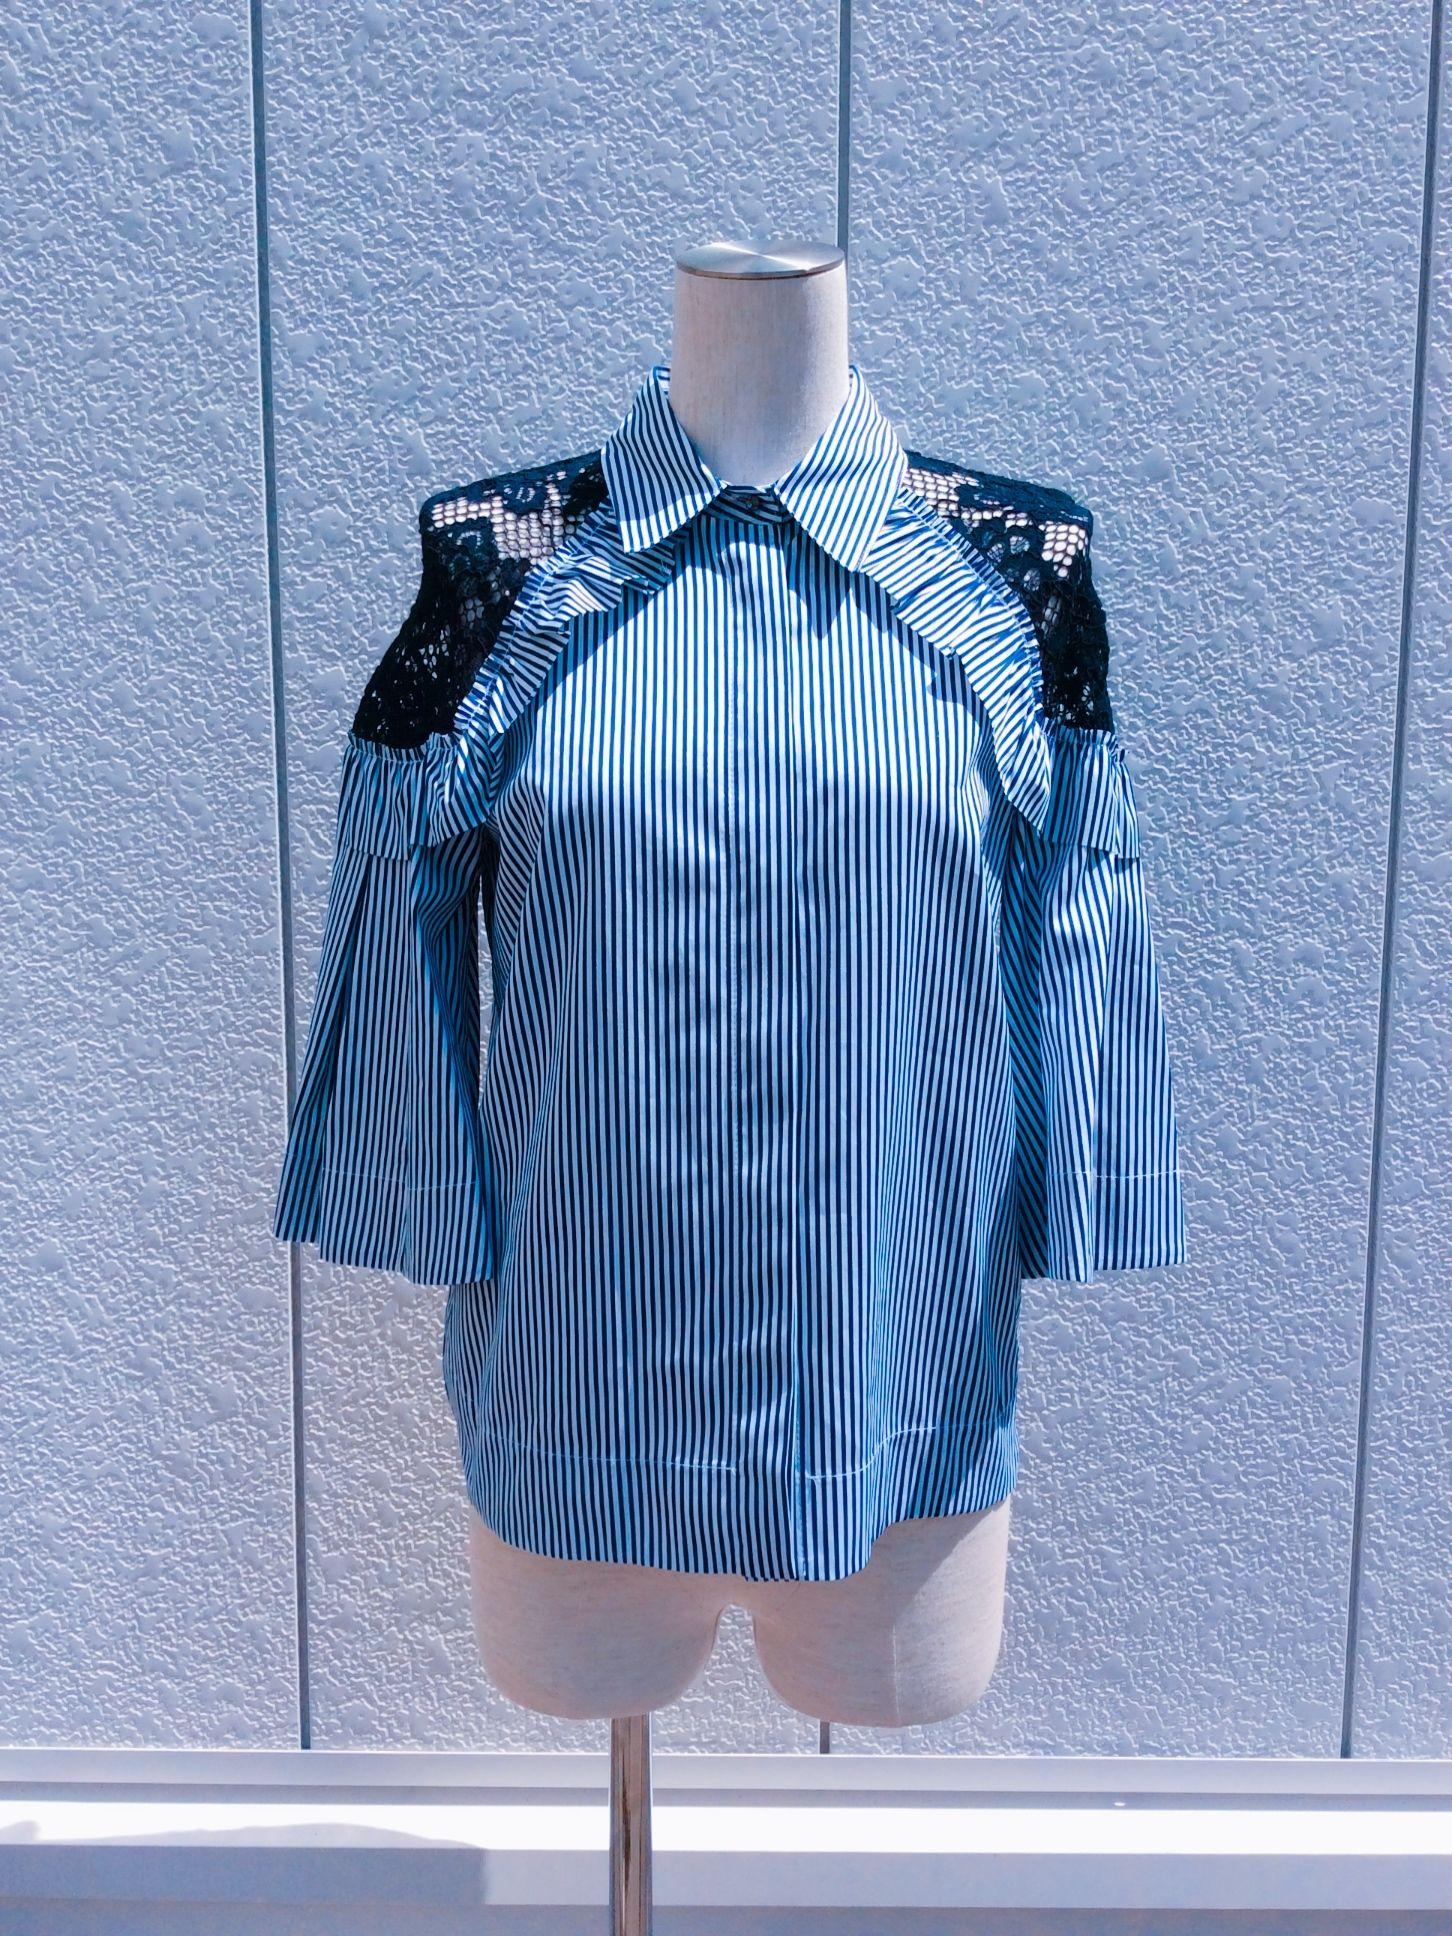 PINKO(ピンコ) lace blouse